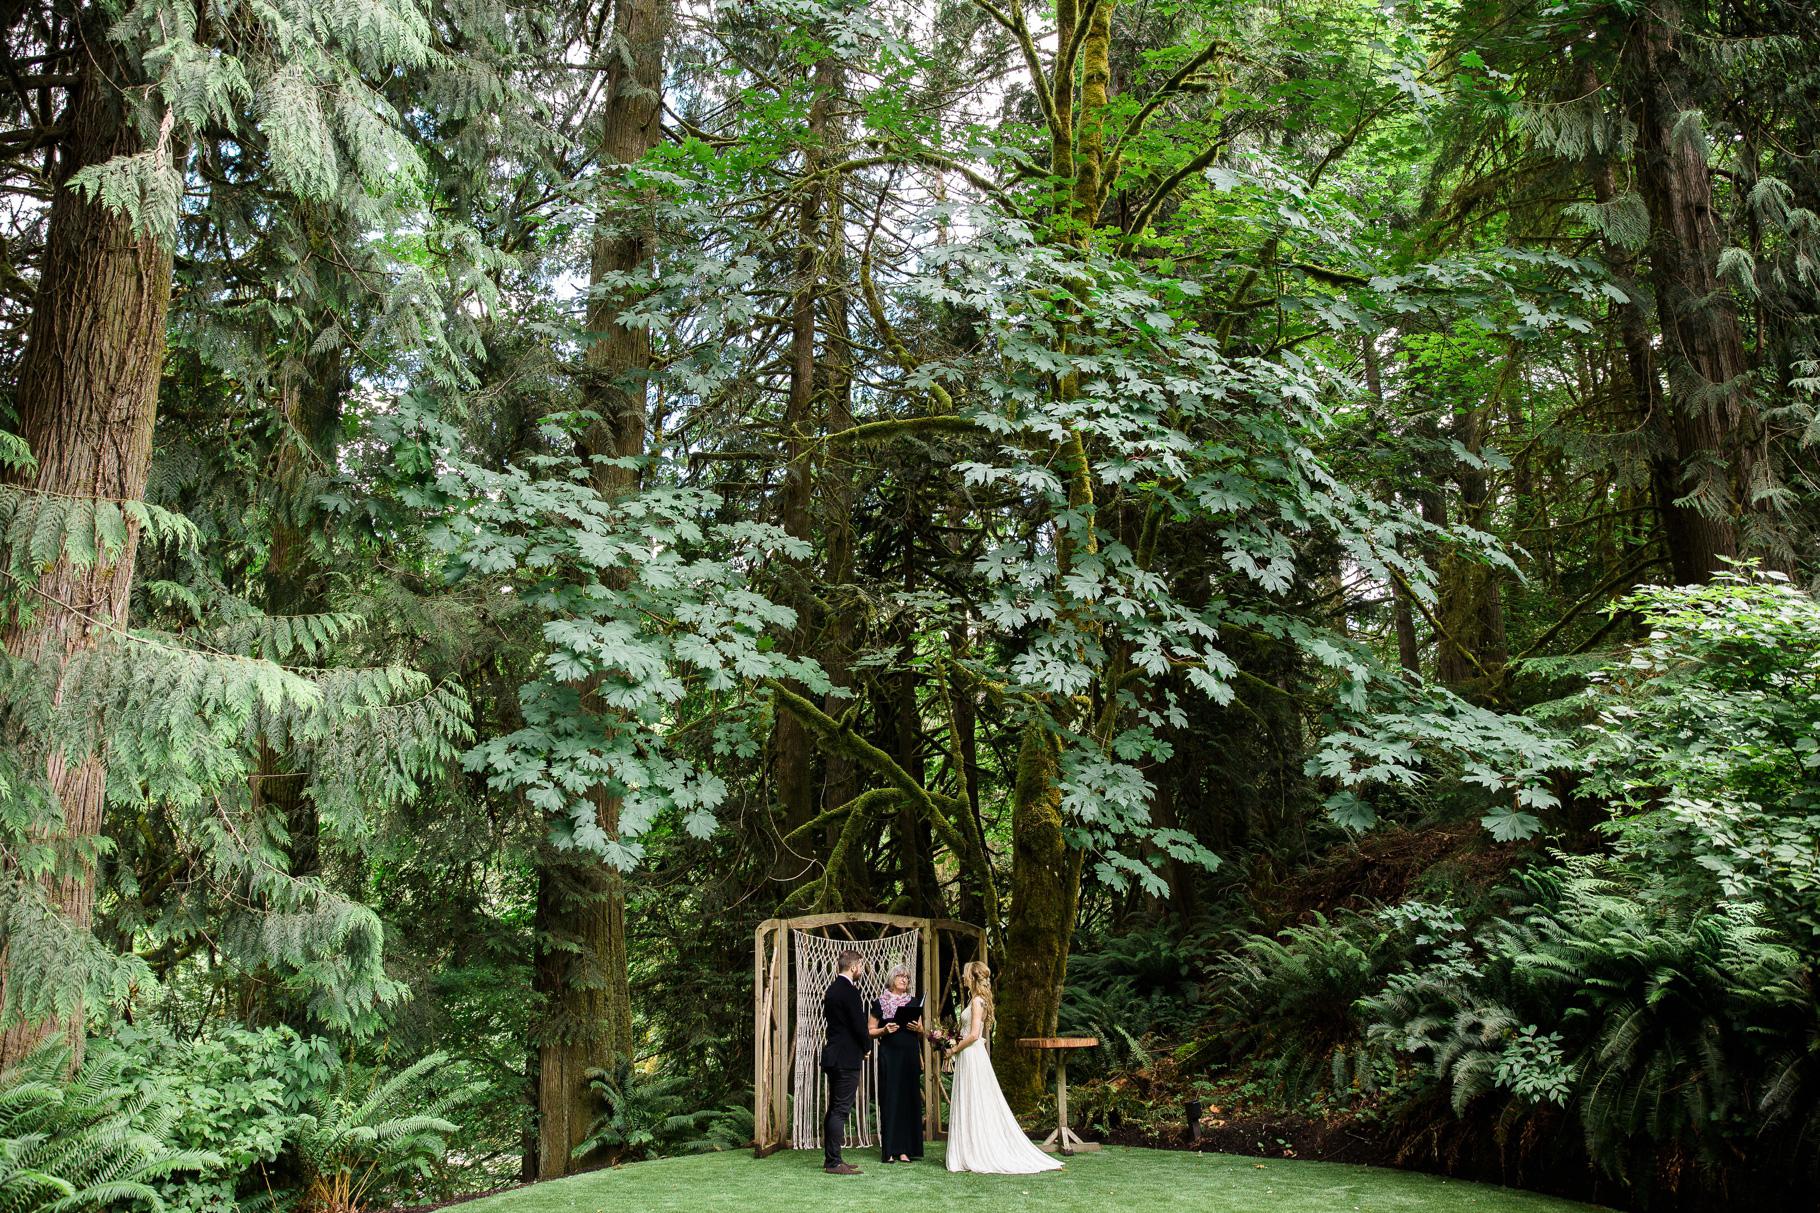 11-Treehouse-Point-Elopement-Seattle-Wedding-Photographer-Ceremony